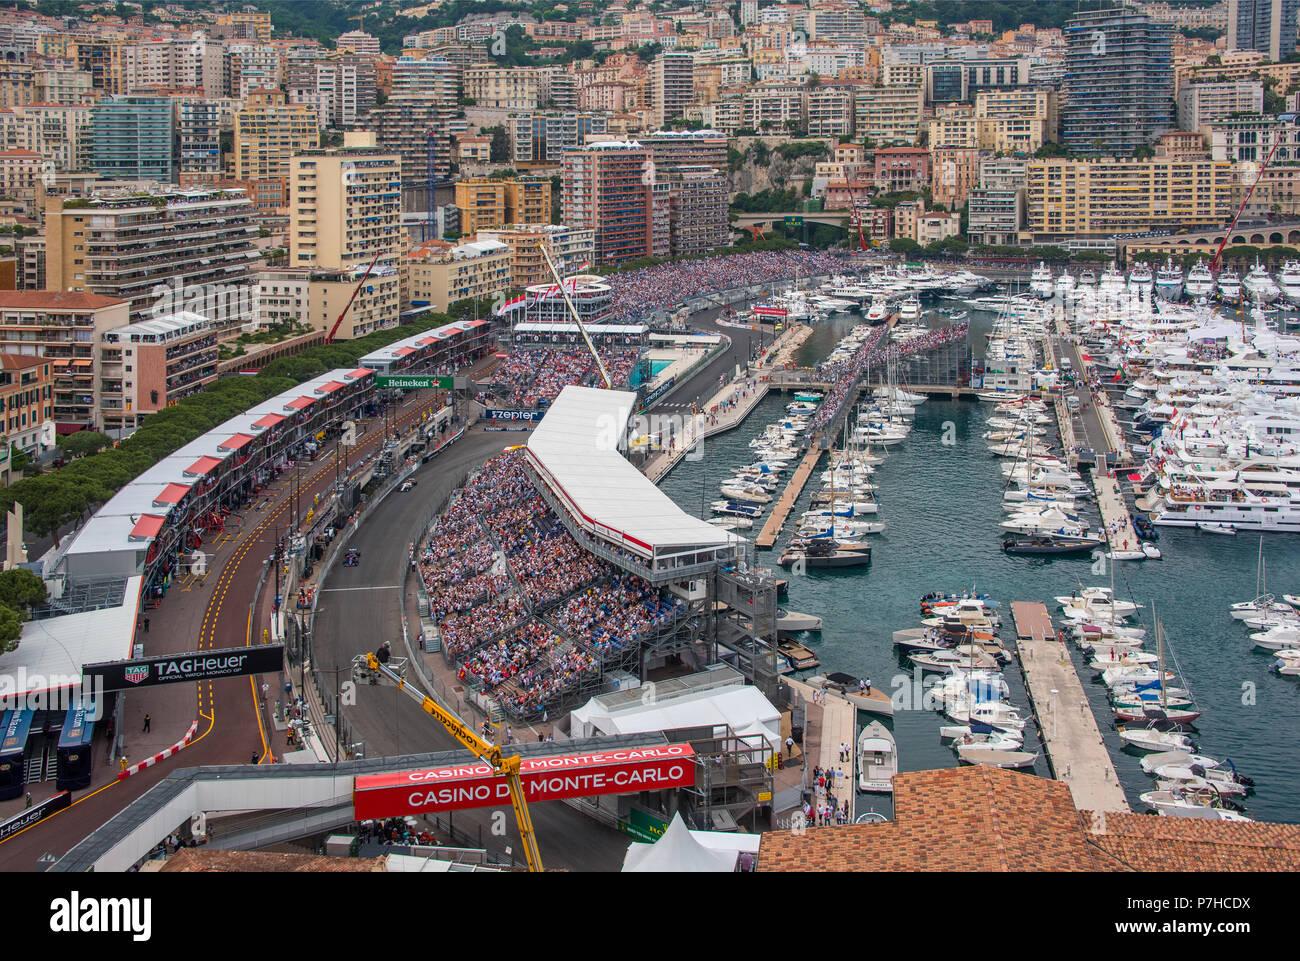 Monaco Grand Prix Piscene Curve - Stock Image